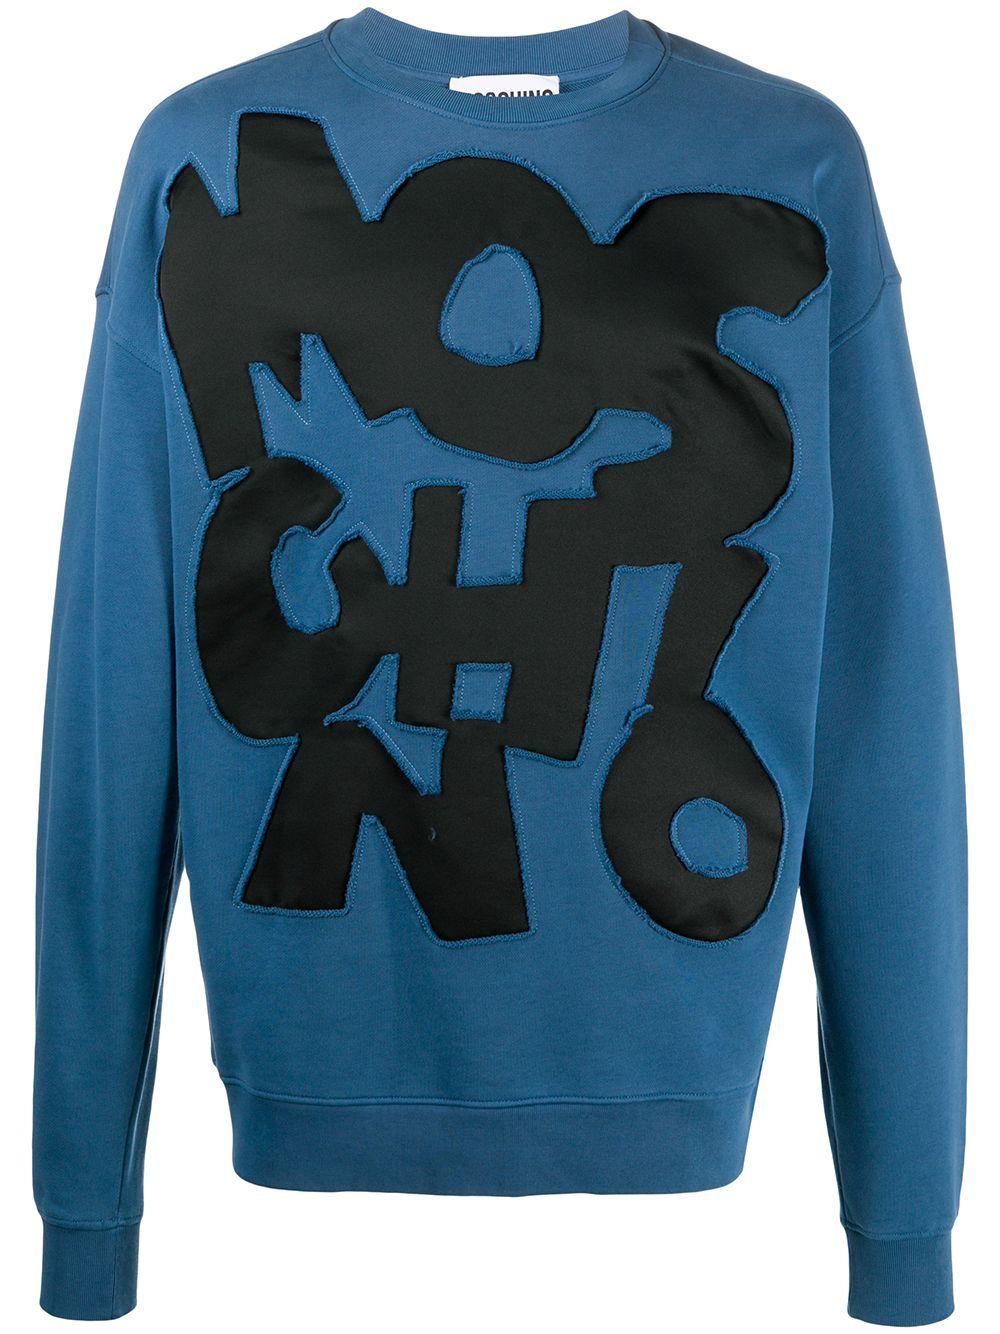 Moschino Applique Logo Cotton Sweatshirt Farfetch Cotton Sweatshirts Sweatshirts Knitwear Men [ 1334 x 1000 Pixel ]